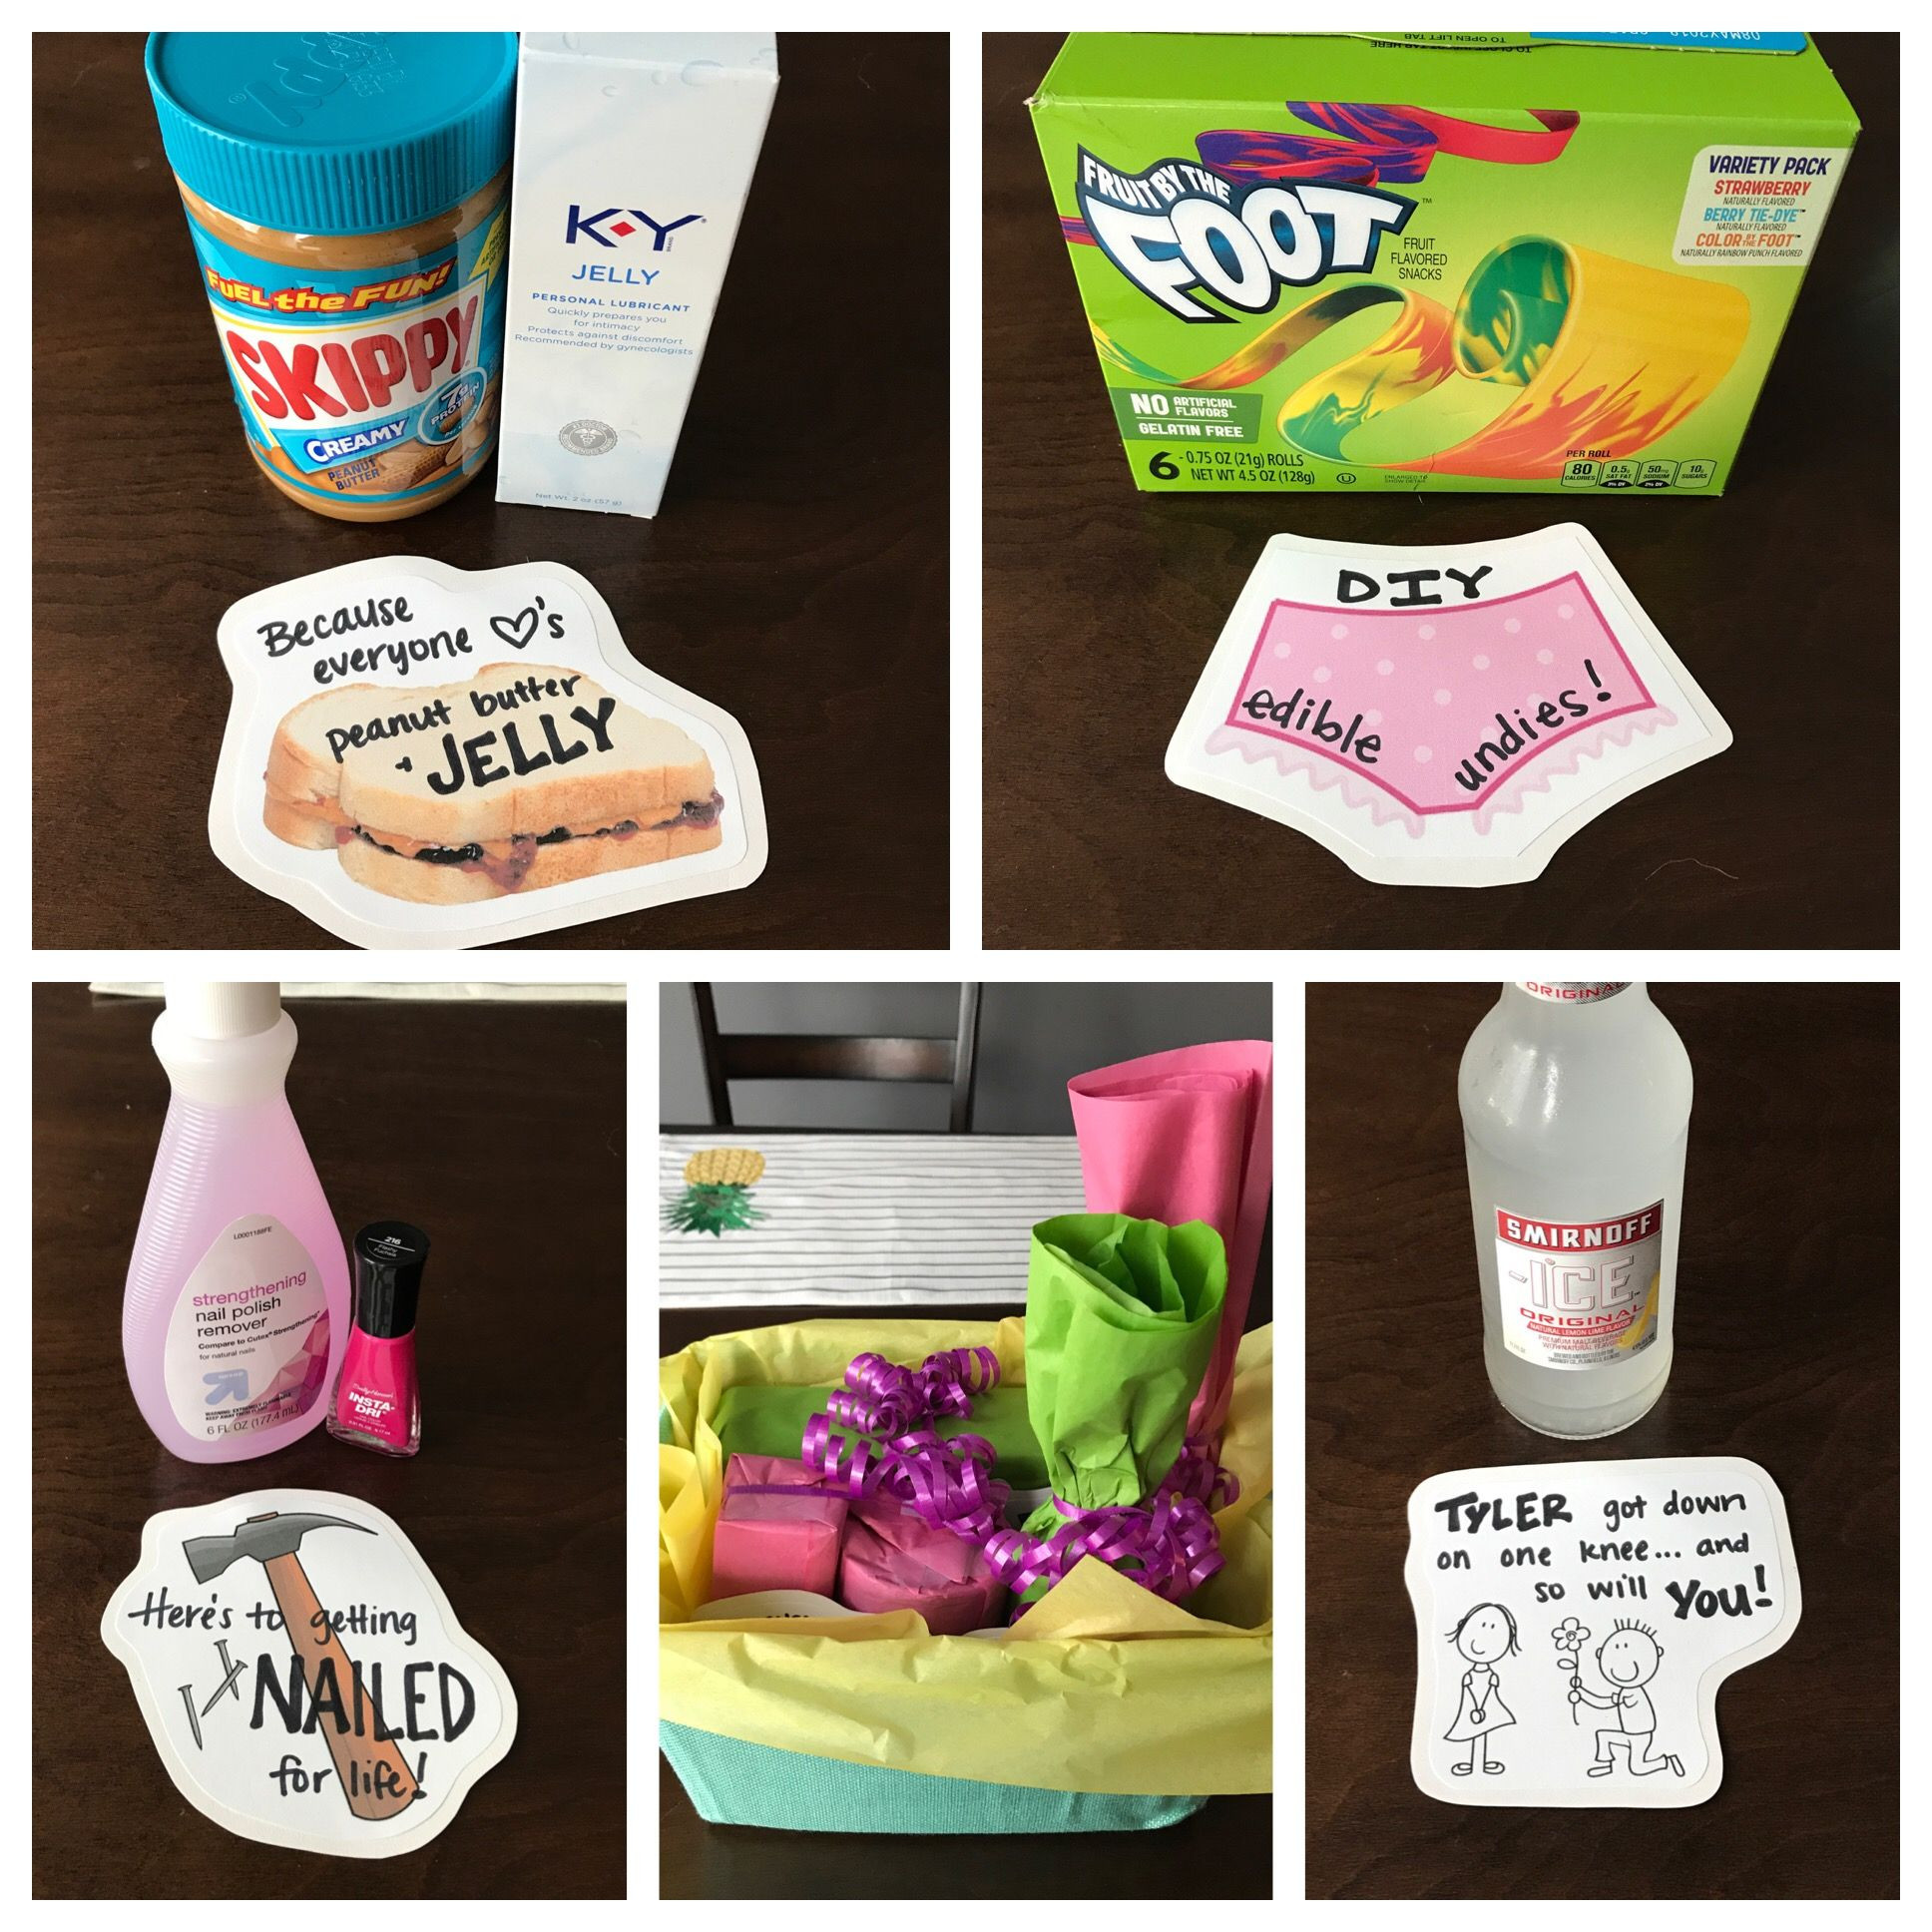 DIY Bachelorette Gift For Bride  Bachelorette Party Gift Semi naughty punny DIY Gift